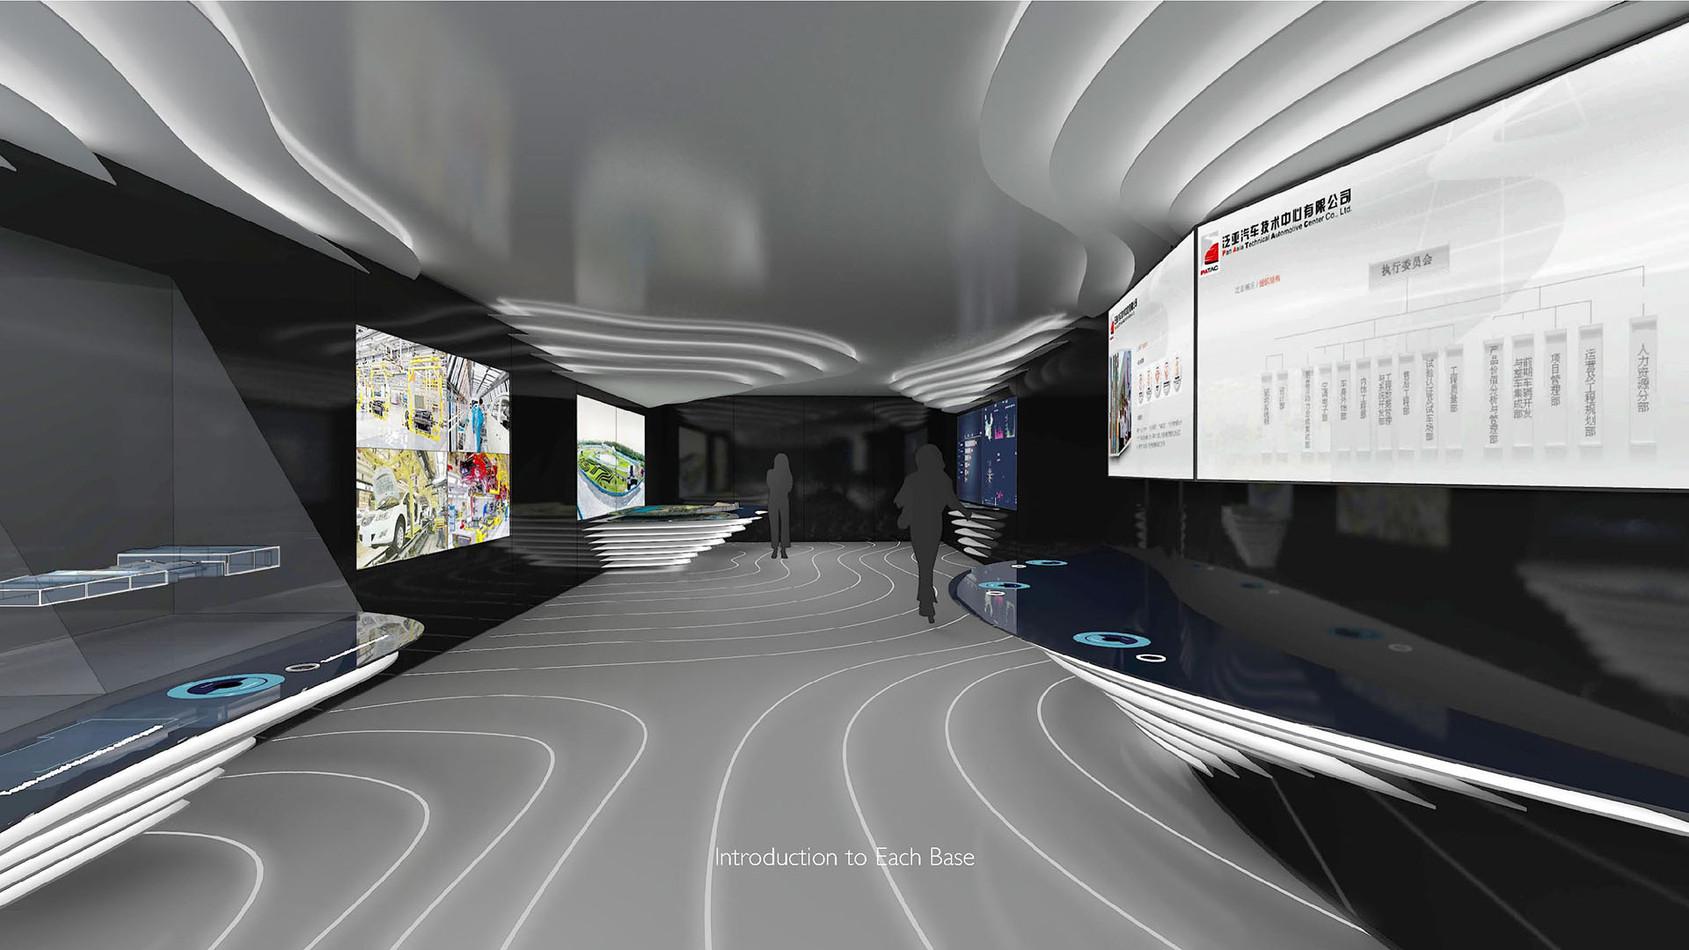 SGM-CORPORATE-MUSEUM-EN 14.jpg